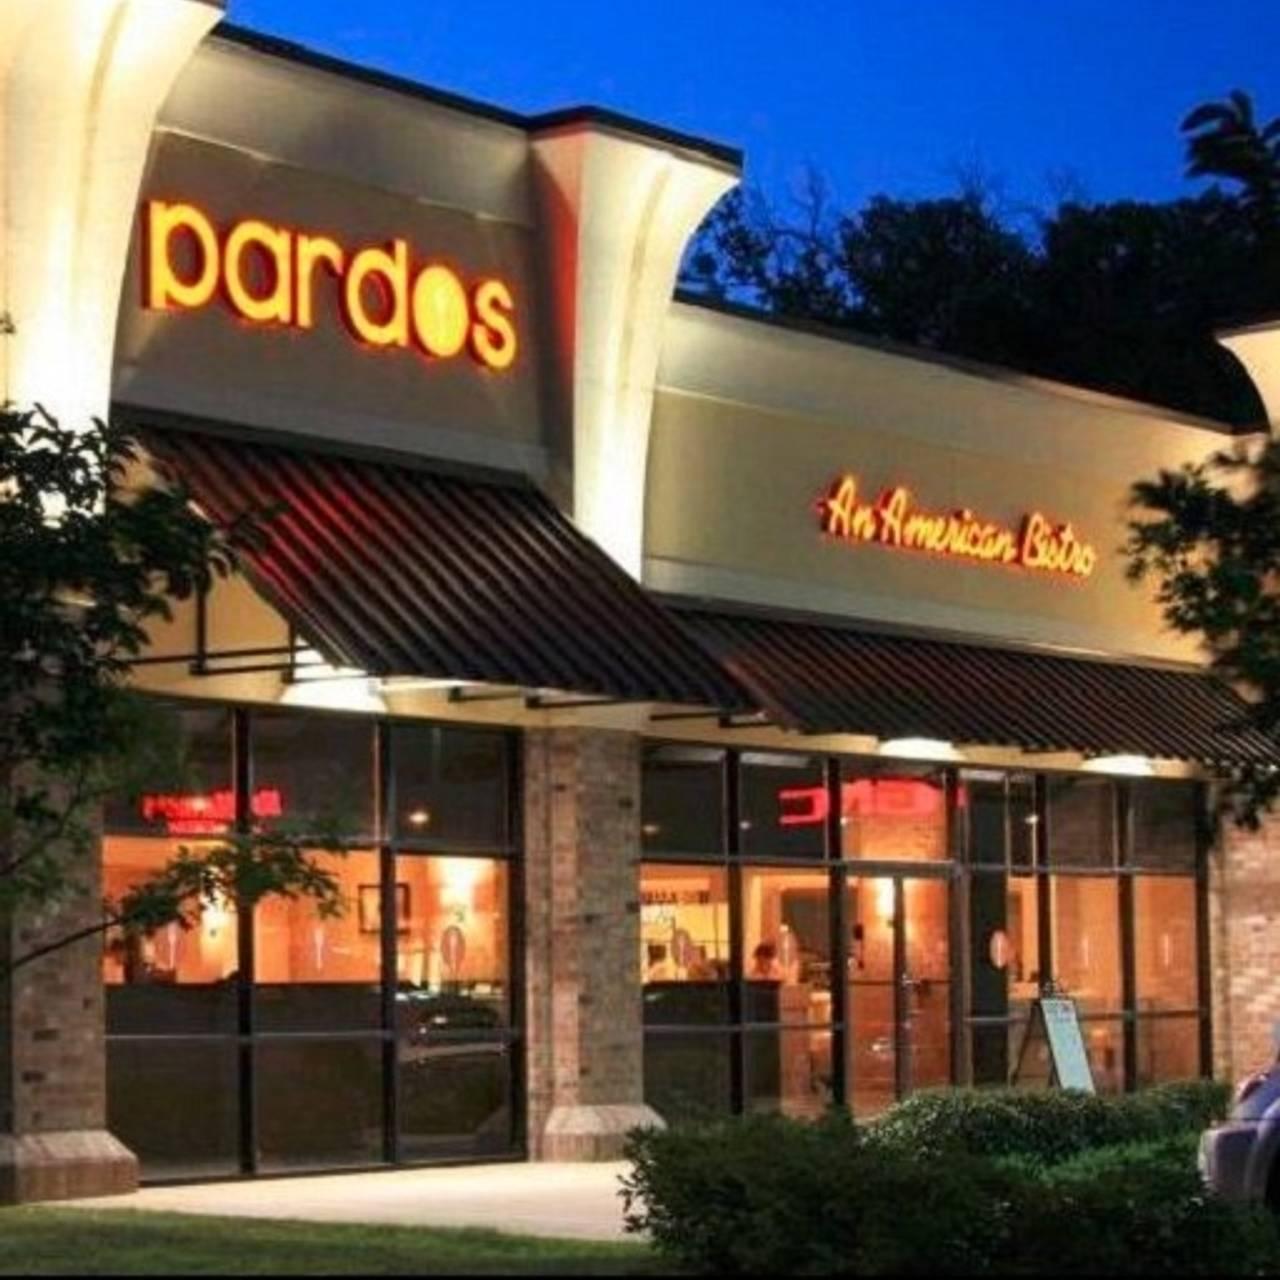 Pardos Restaurant Covington La Opentable